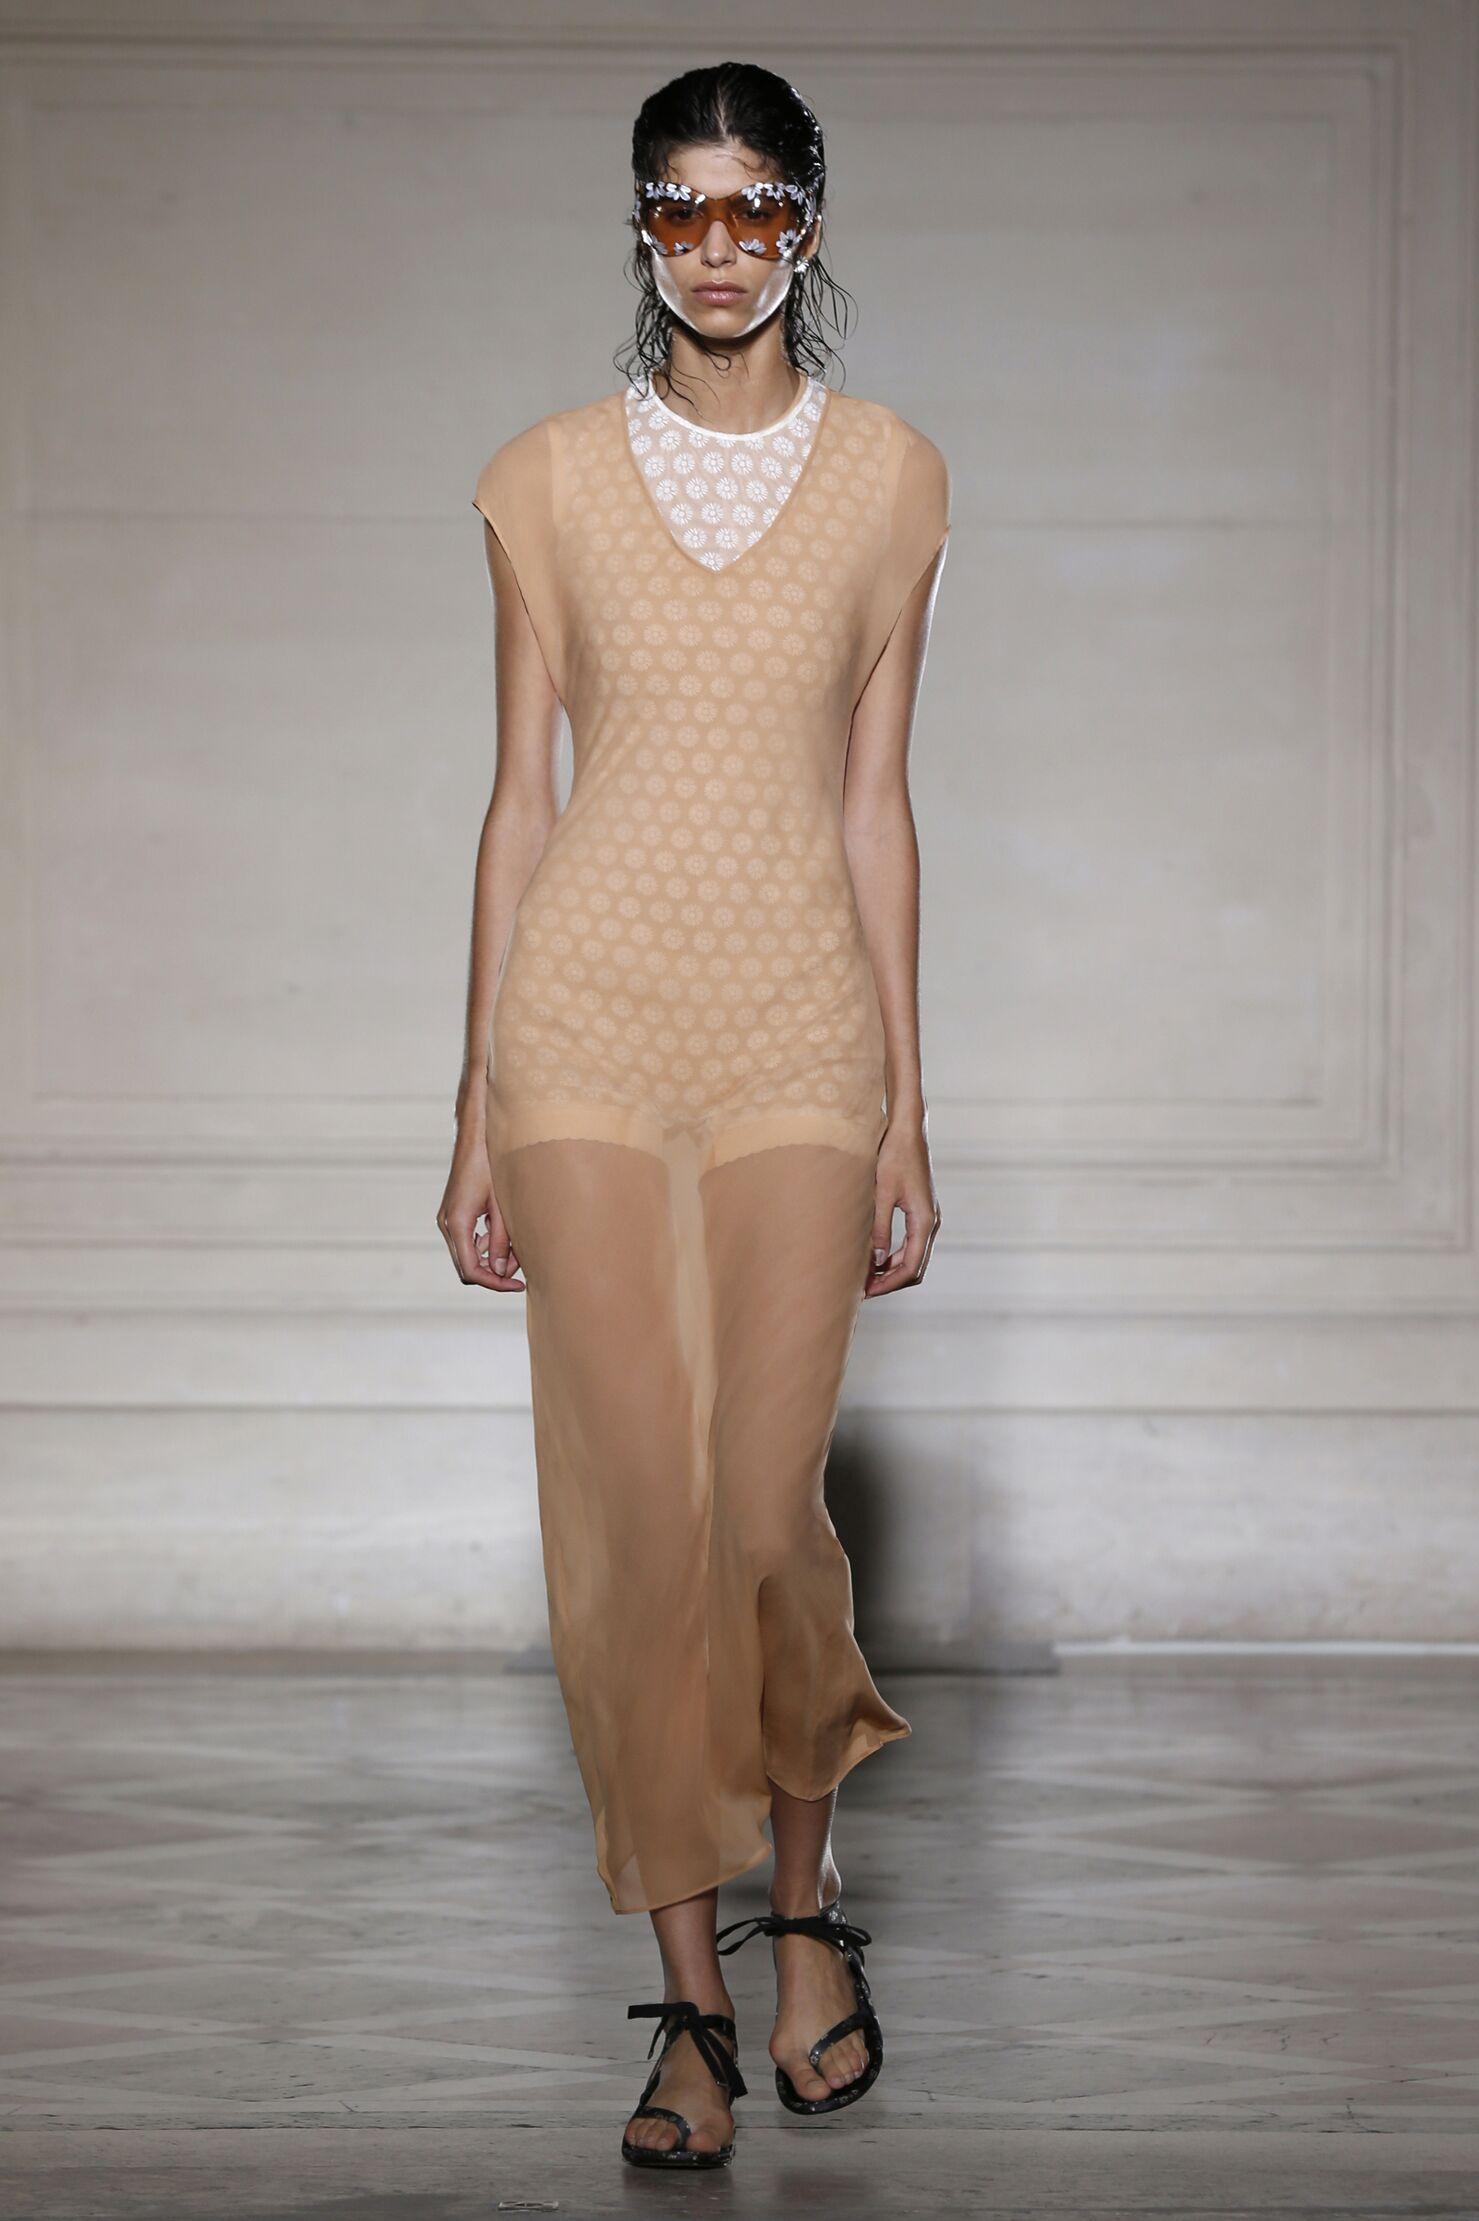 2015 Woman Style Maison Martin Margiela